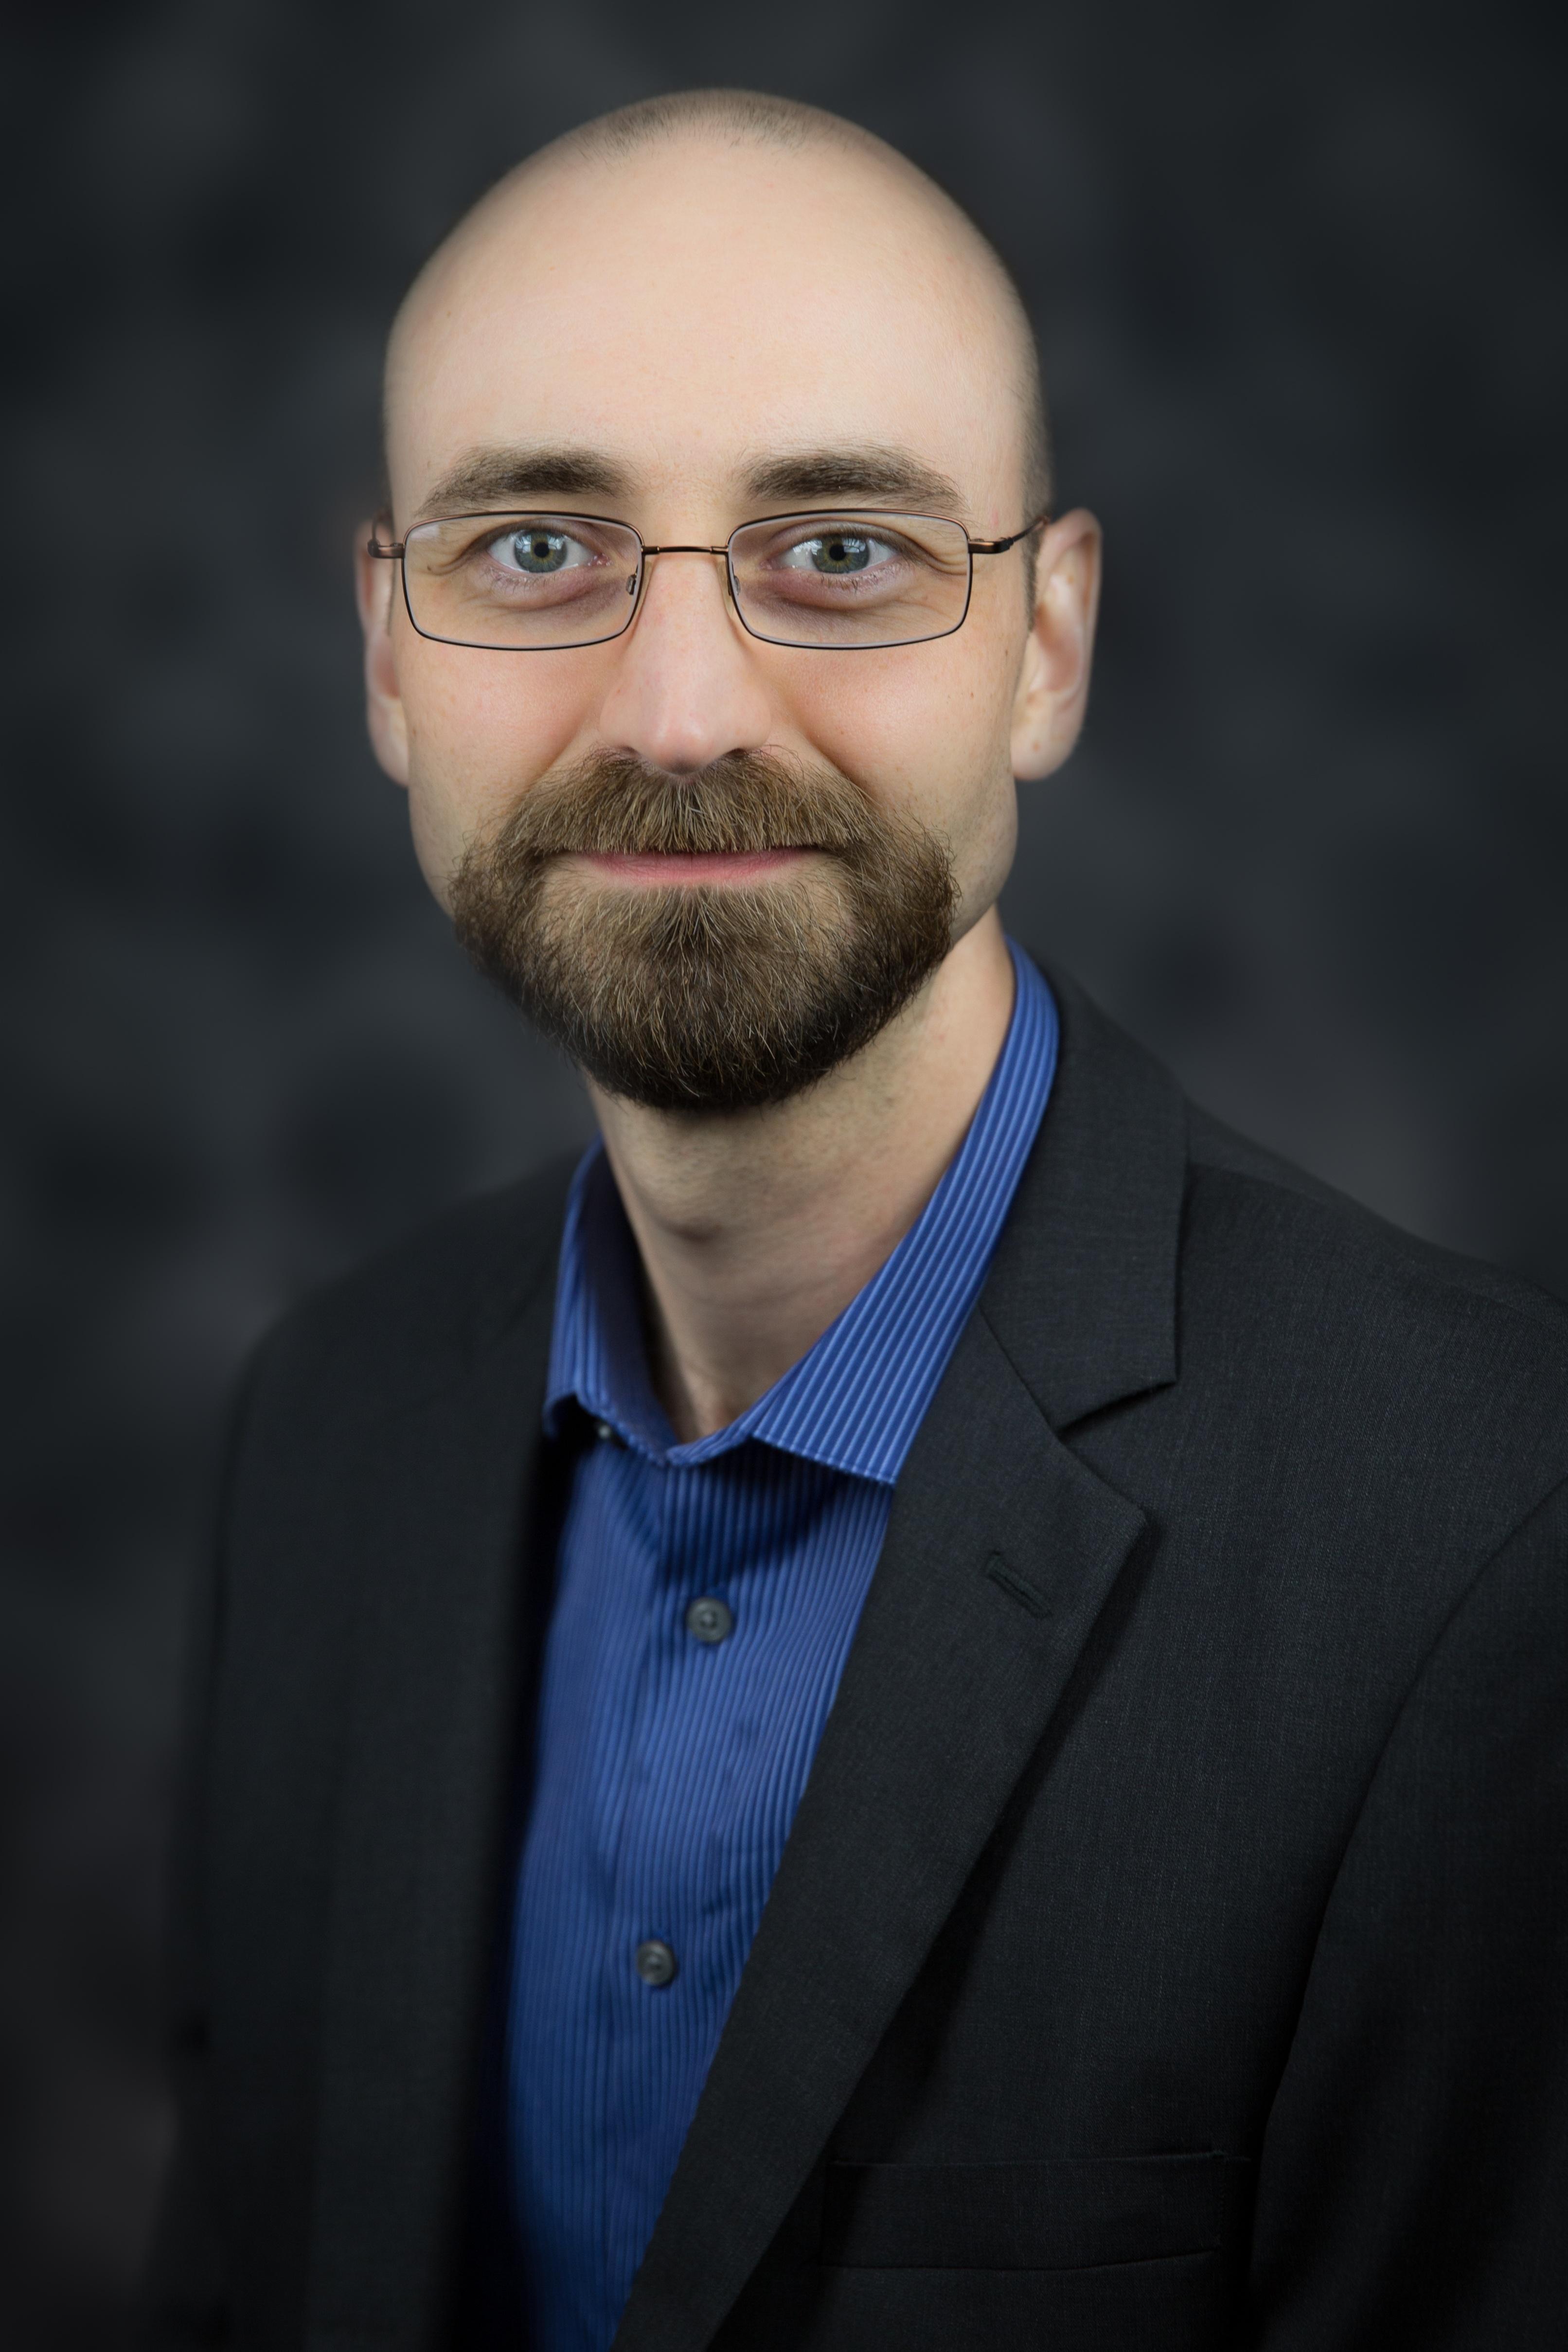 Martin Przeworski